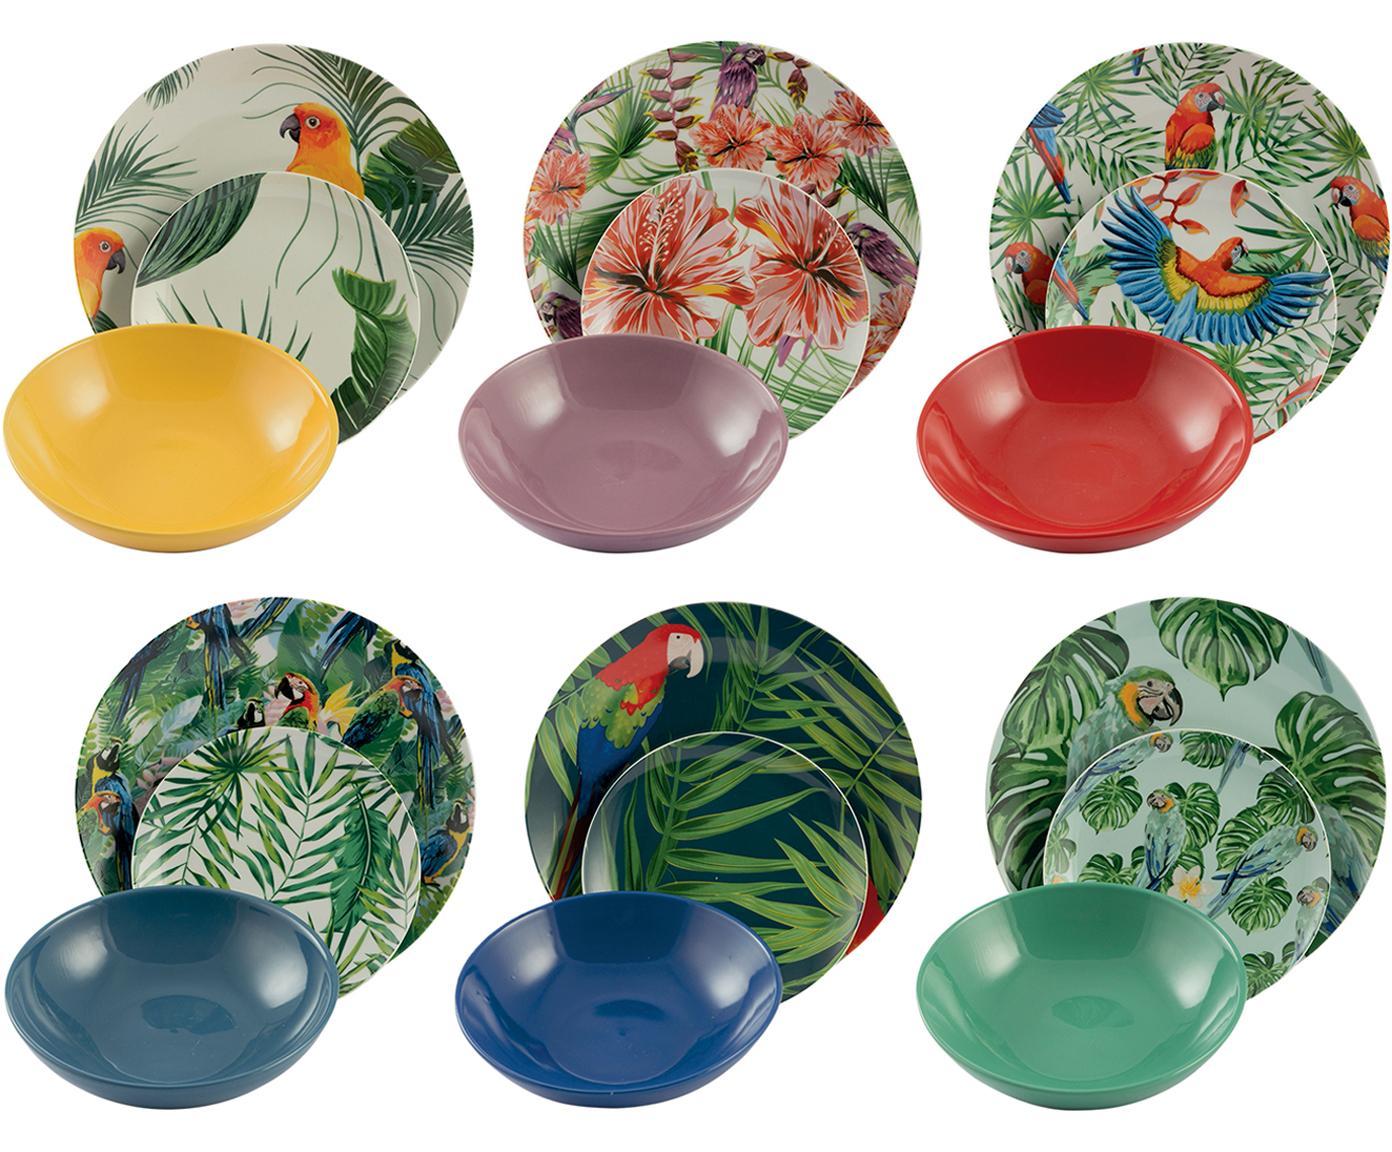 Geschirr-Set Parrot Jungle, 6 Personen (18-tlg.), Porzellan, Mehrfarbig, Verschiedene Grössen